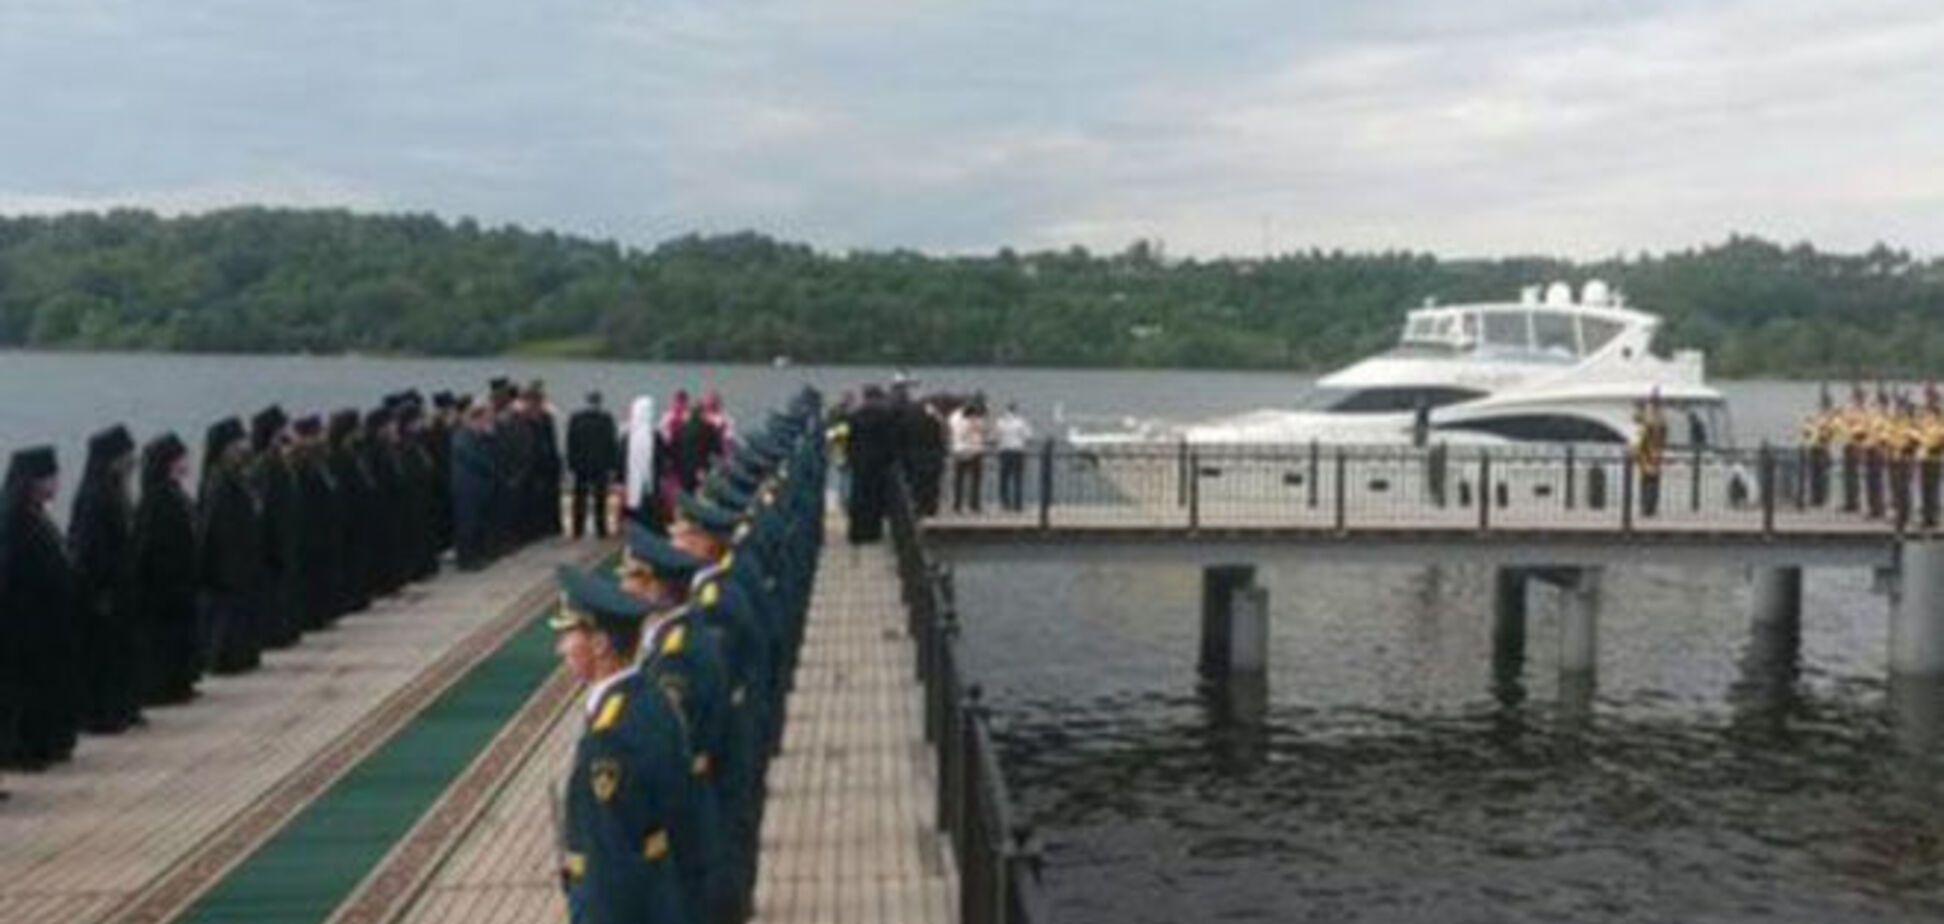 Люксовая яхта патриарха Кирилла произвела фурор: реакция соцсетей